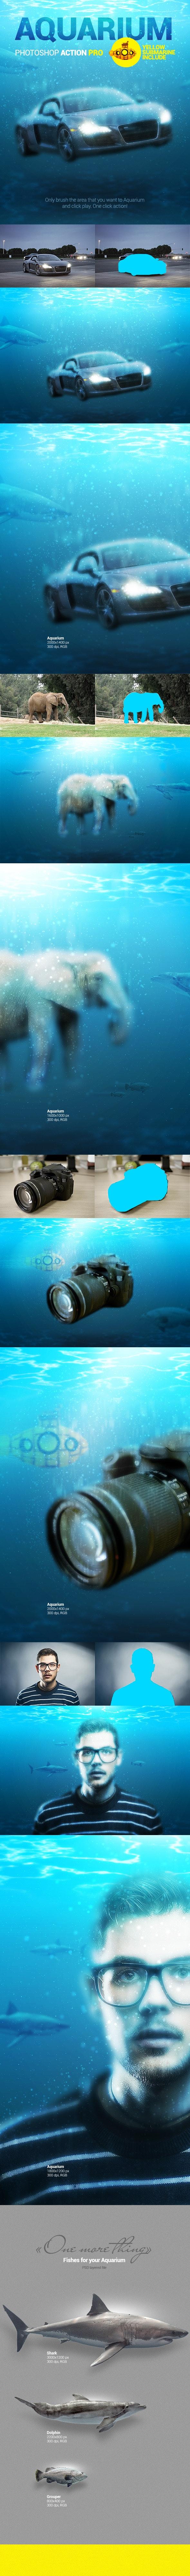 Underwater - Aquarium - Photoshop Action - Photo Effects Actions